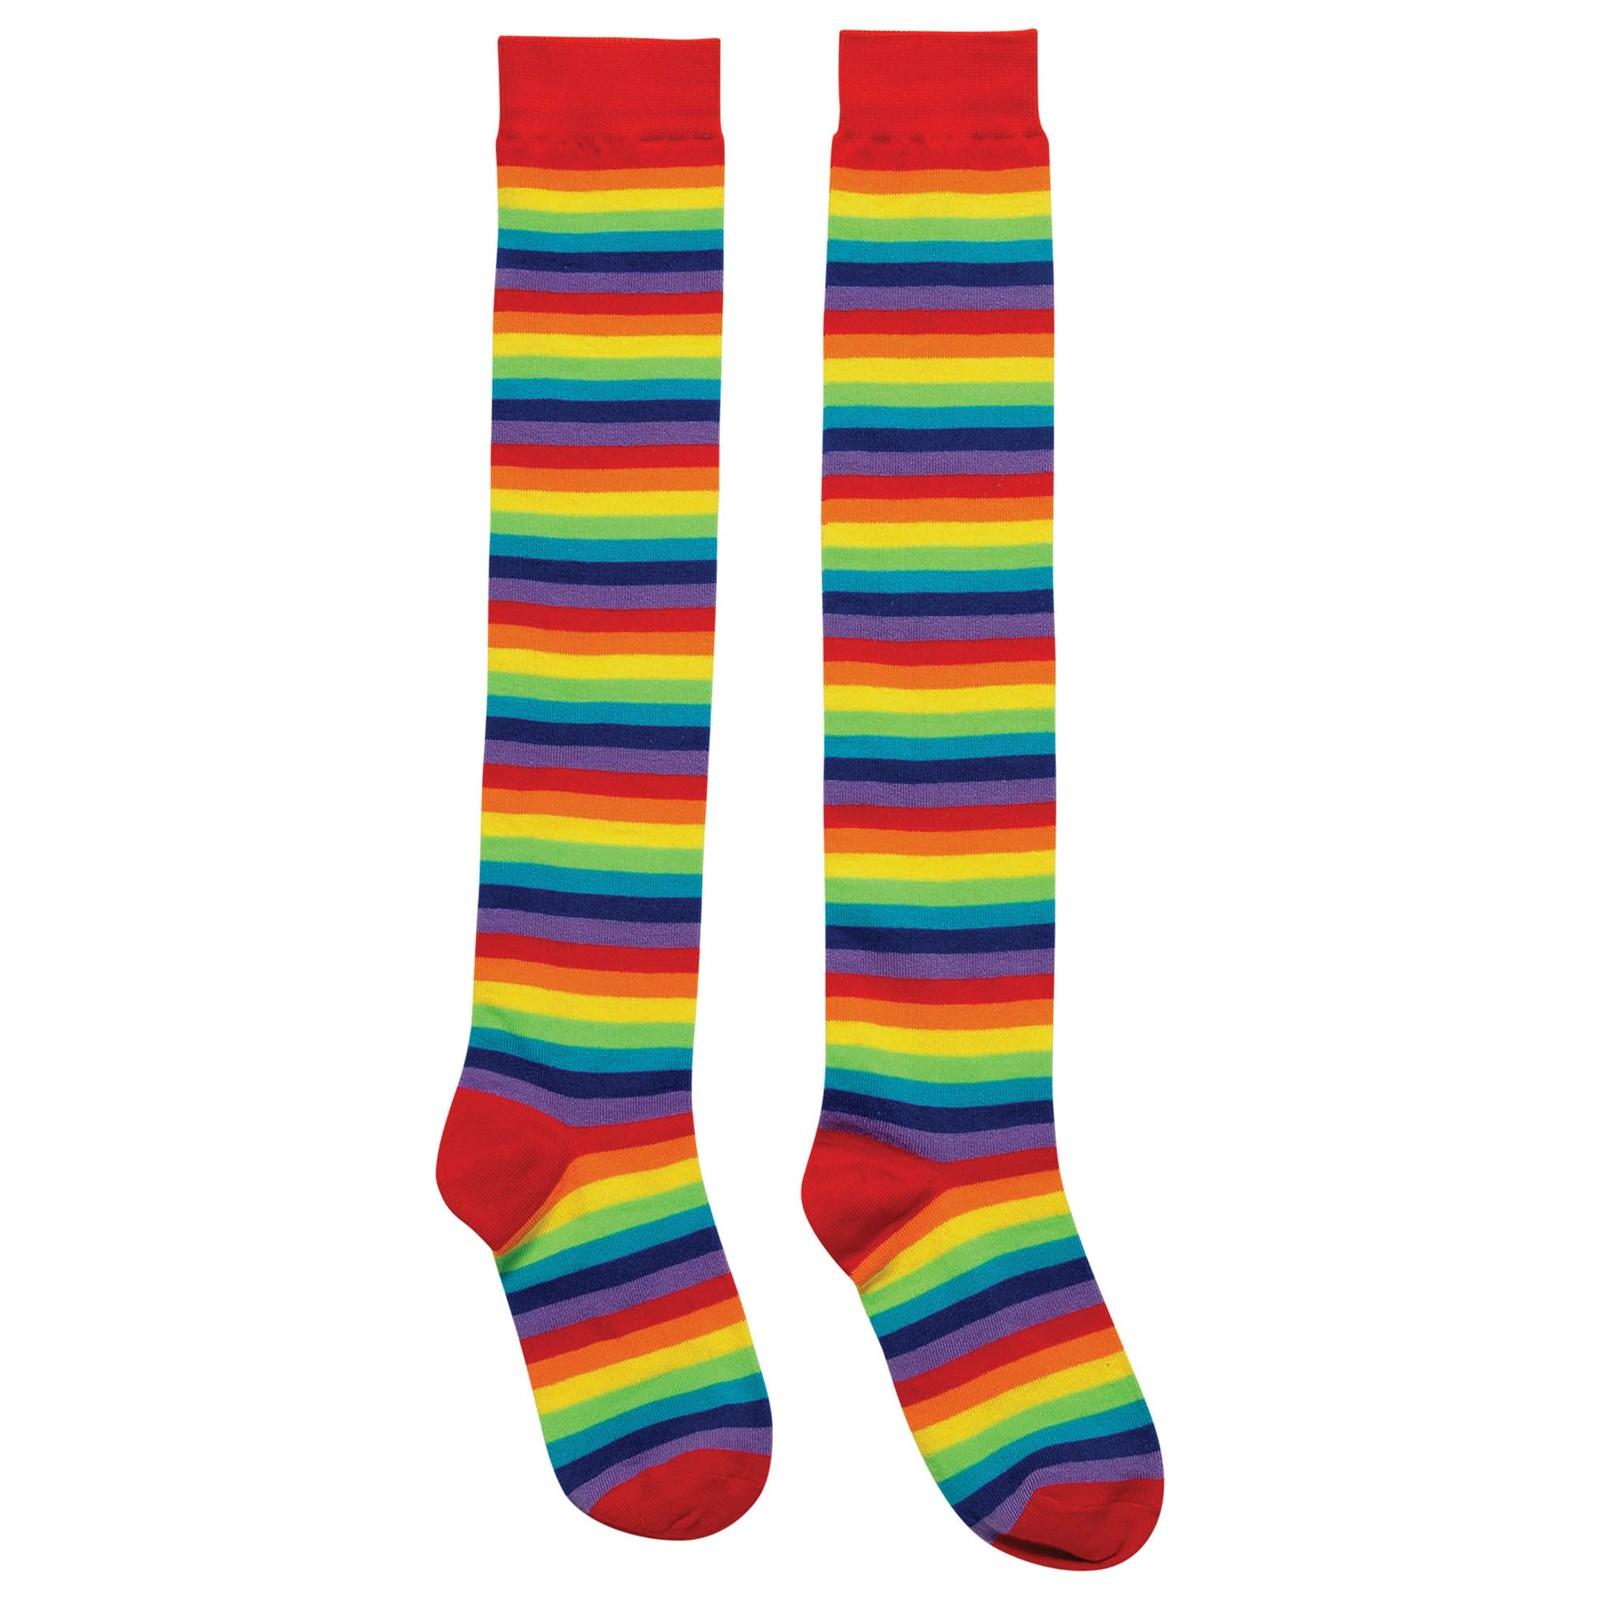 Rainbow Knee High Socks Halloween Costume Accessory